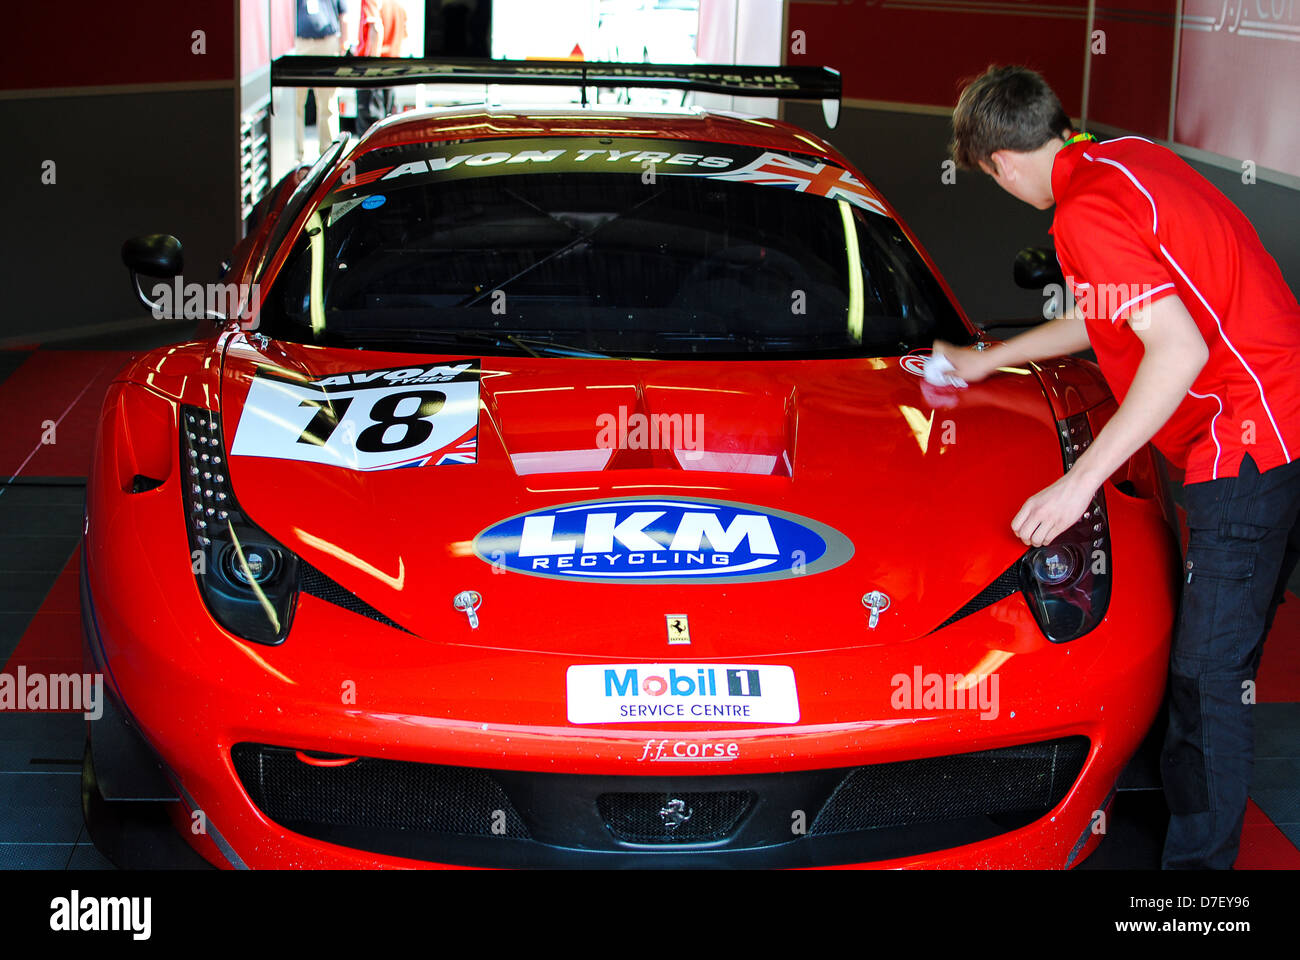 Ferrari race car being polished - Stock Image